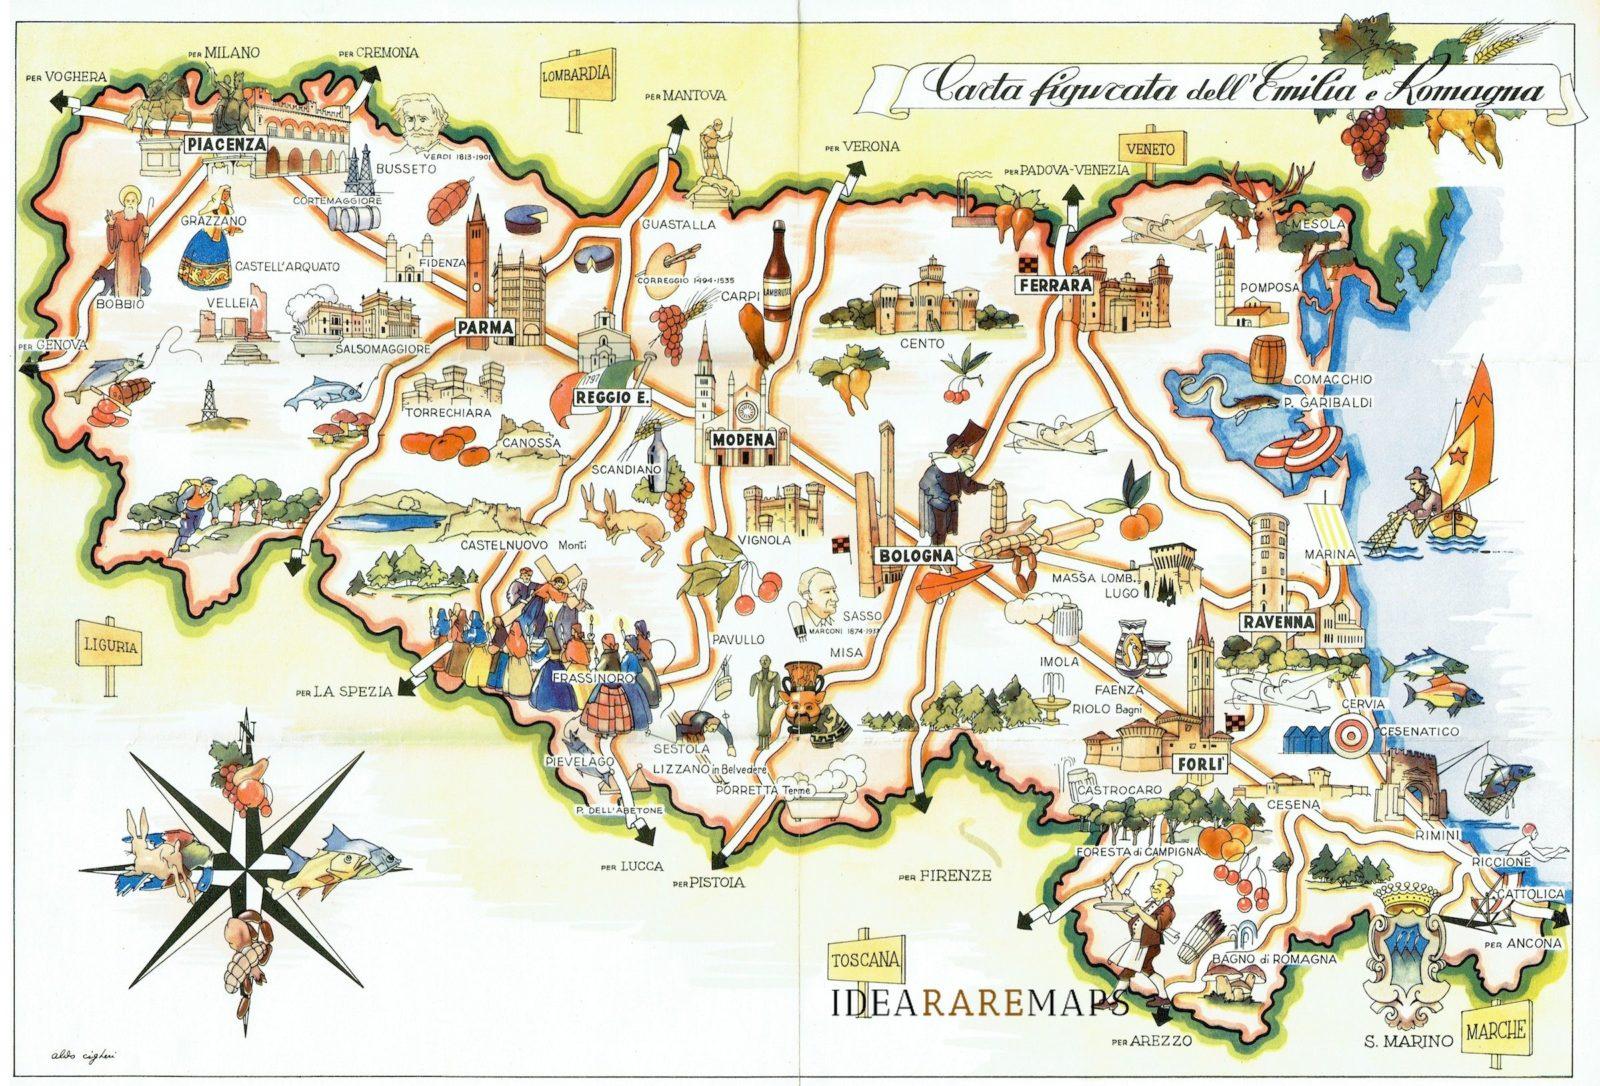 Cartina Geografica Italia Parma.Carta Figurata Dell Emilia Romagna Idea Rare Maps